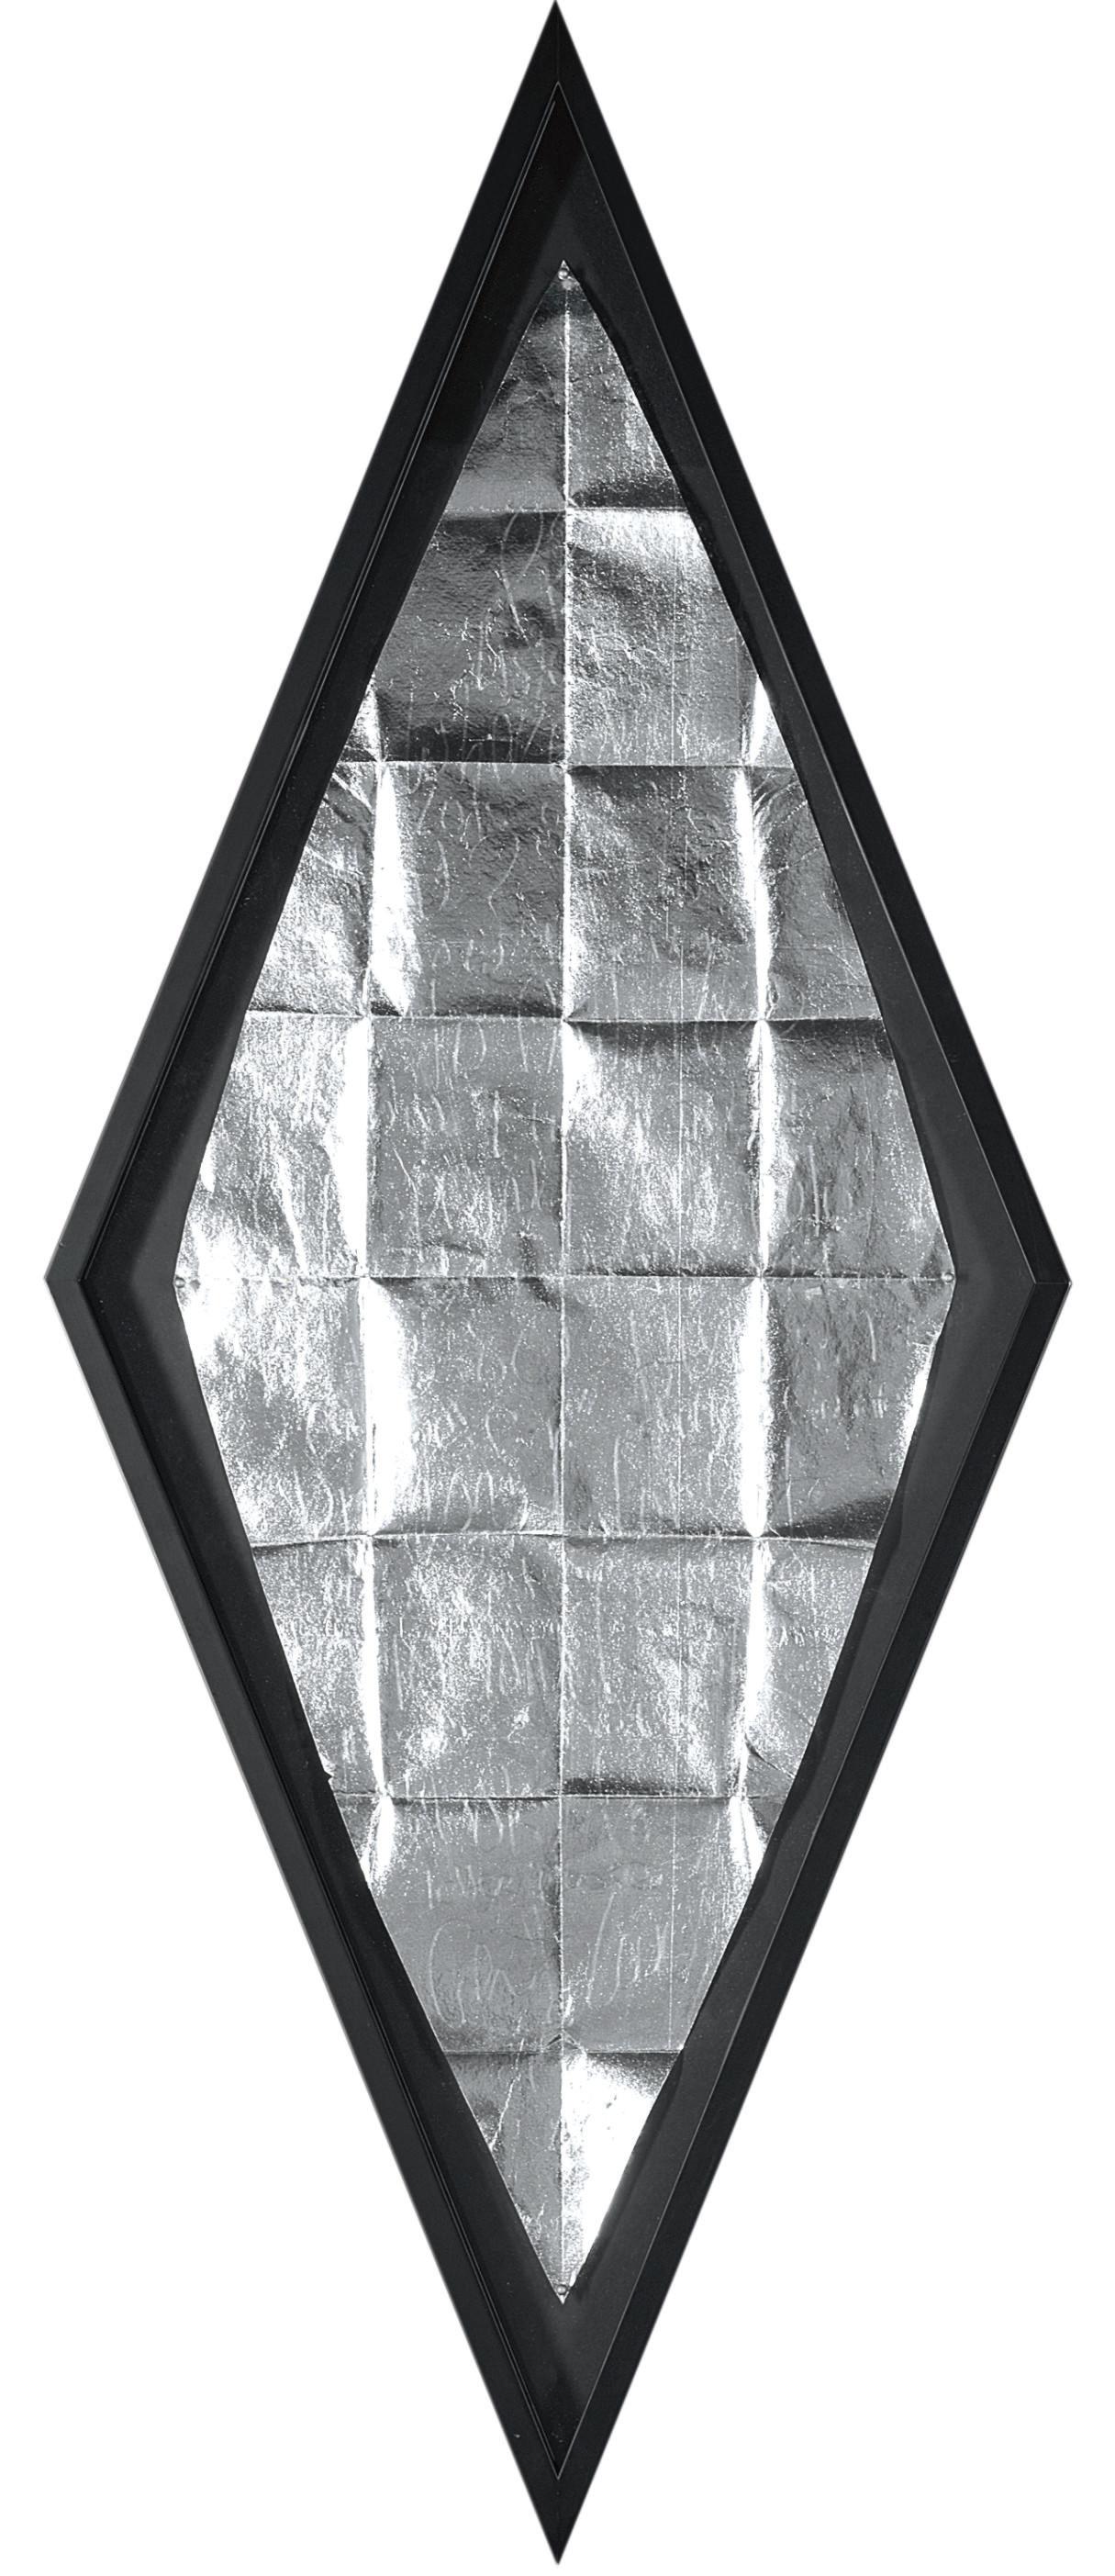 Exhbition Project, 80 Diamonds